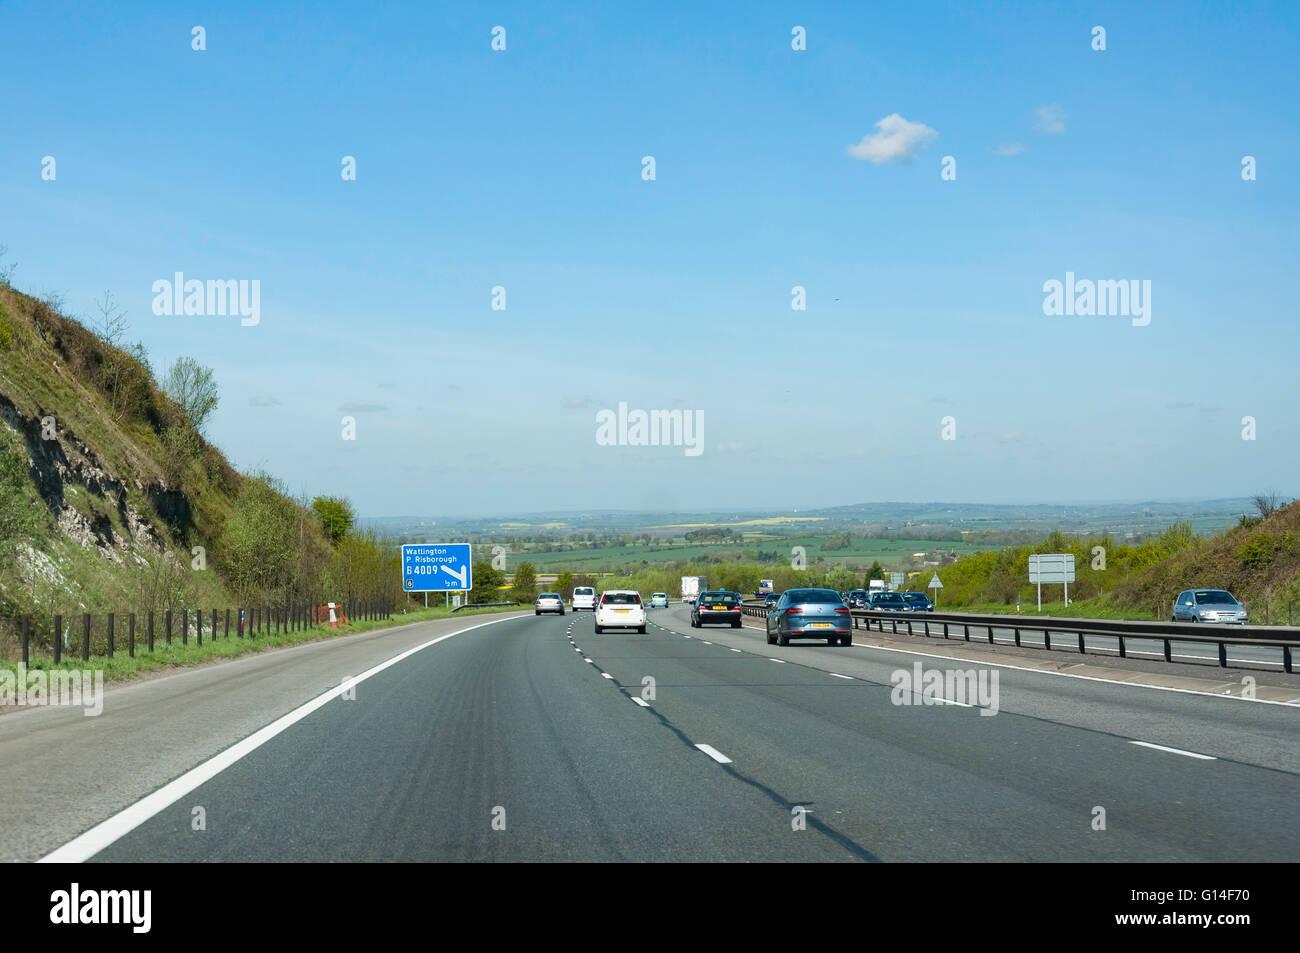 M40 Motorway at Junction 6, Oxfordshire, England, United Kingdom - Stock Image